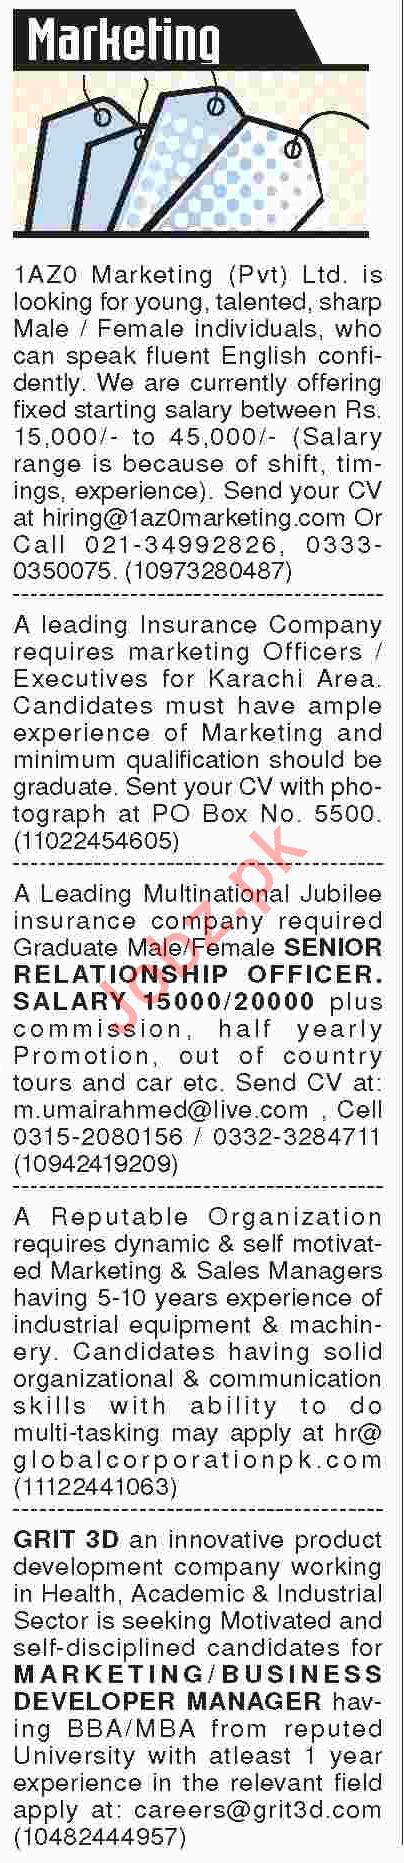 Marketing Job Opportunity 2018 in Karachi